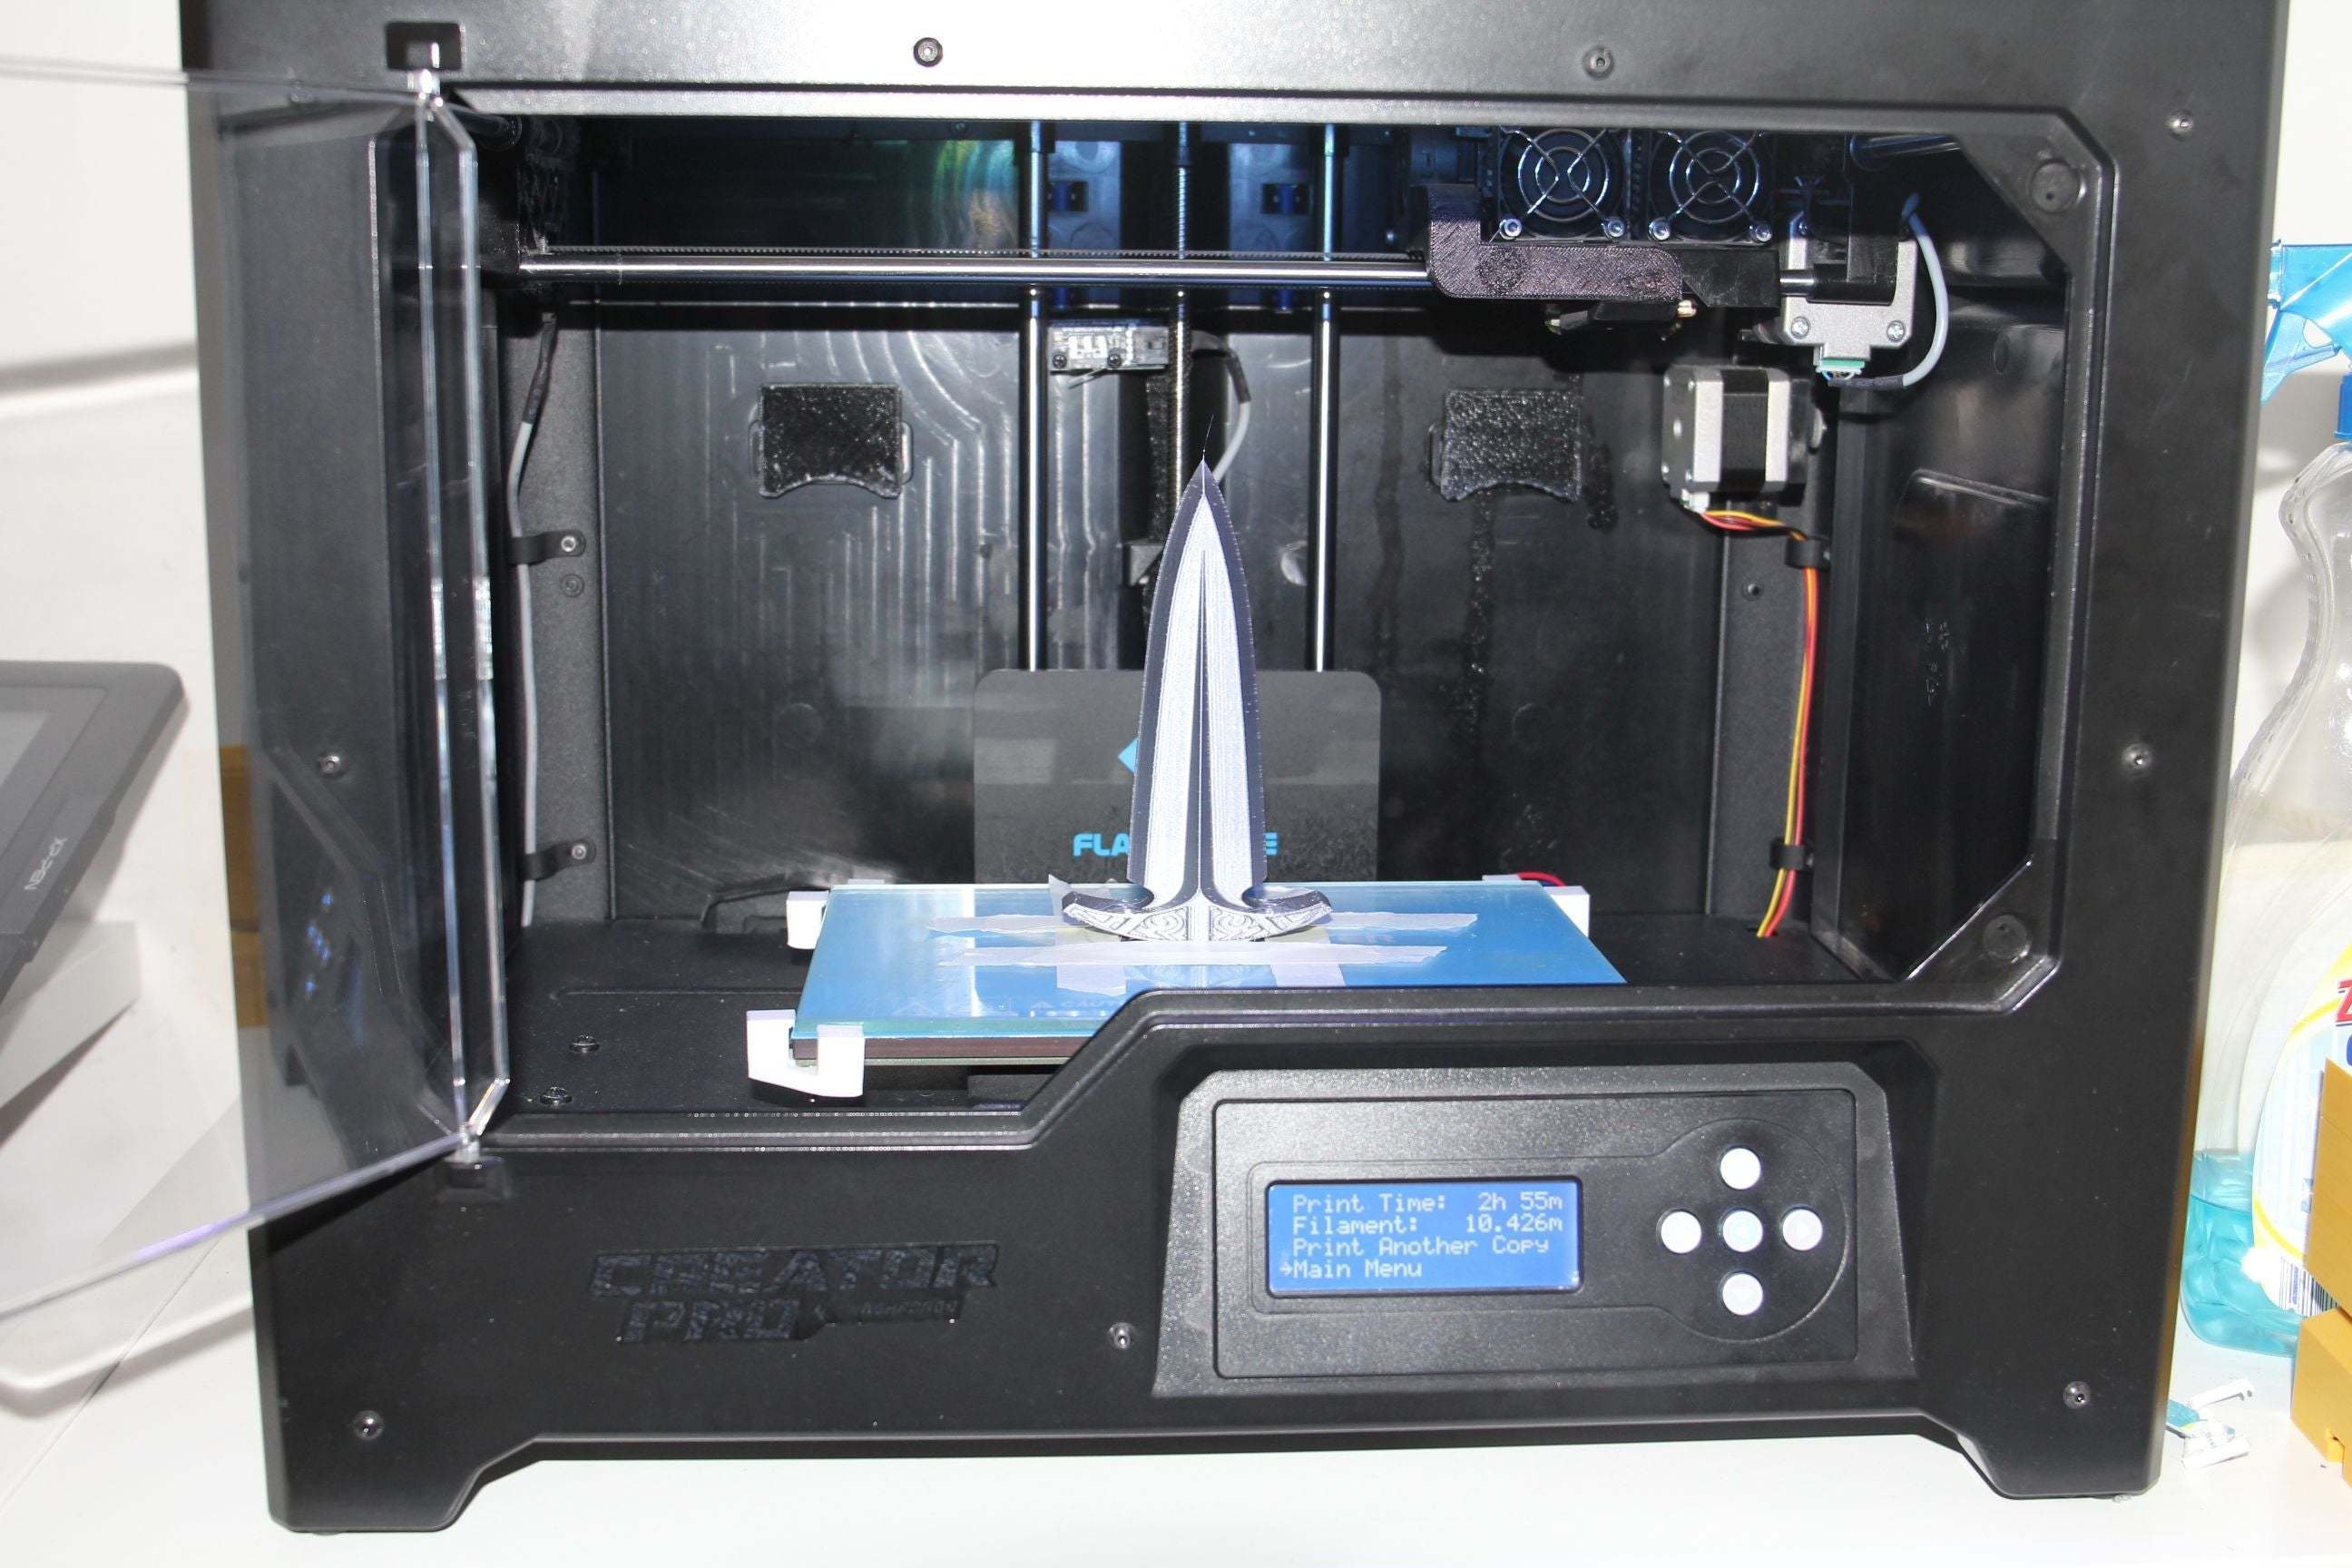 dagger1.jpg Download free STL file Dagger - easy to print, no support • 3D printable model, plokr